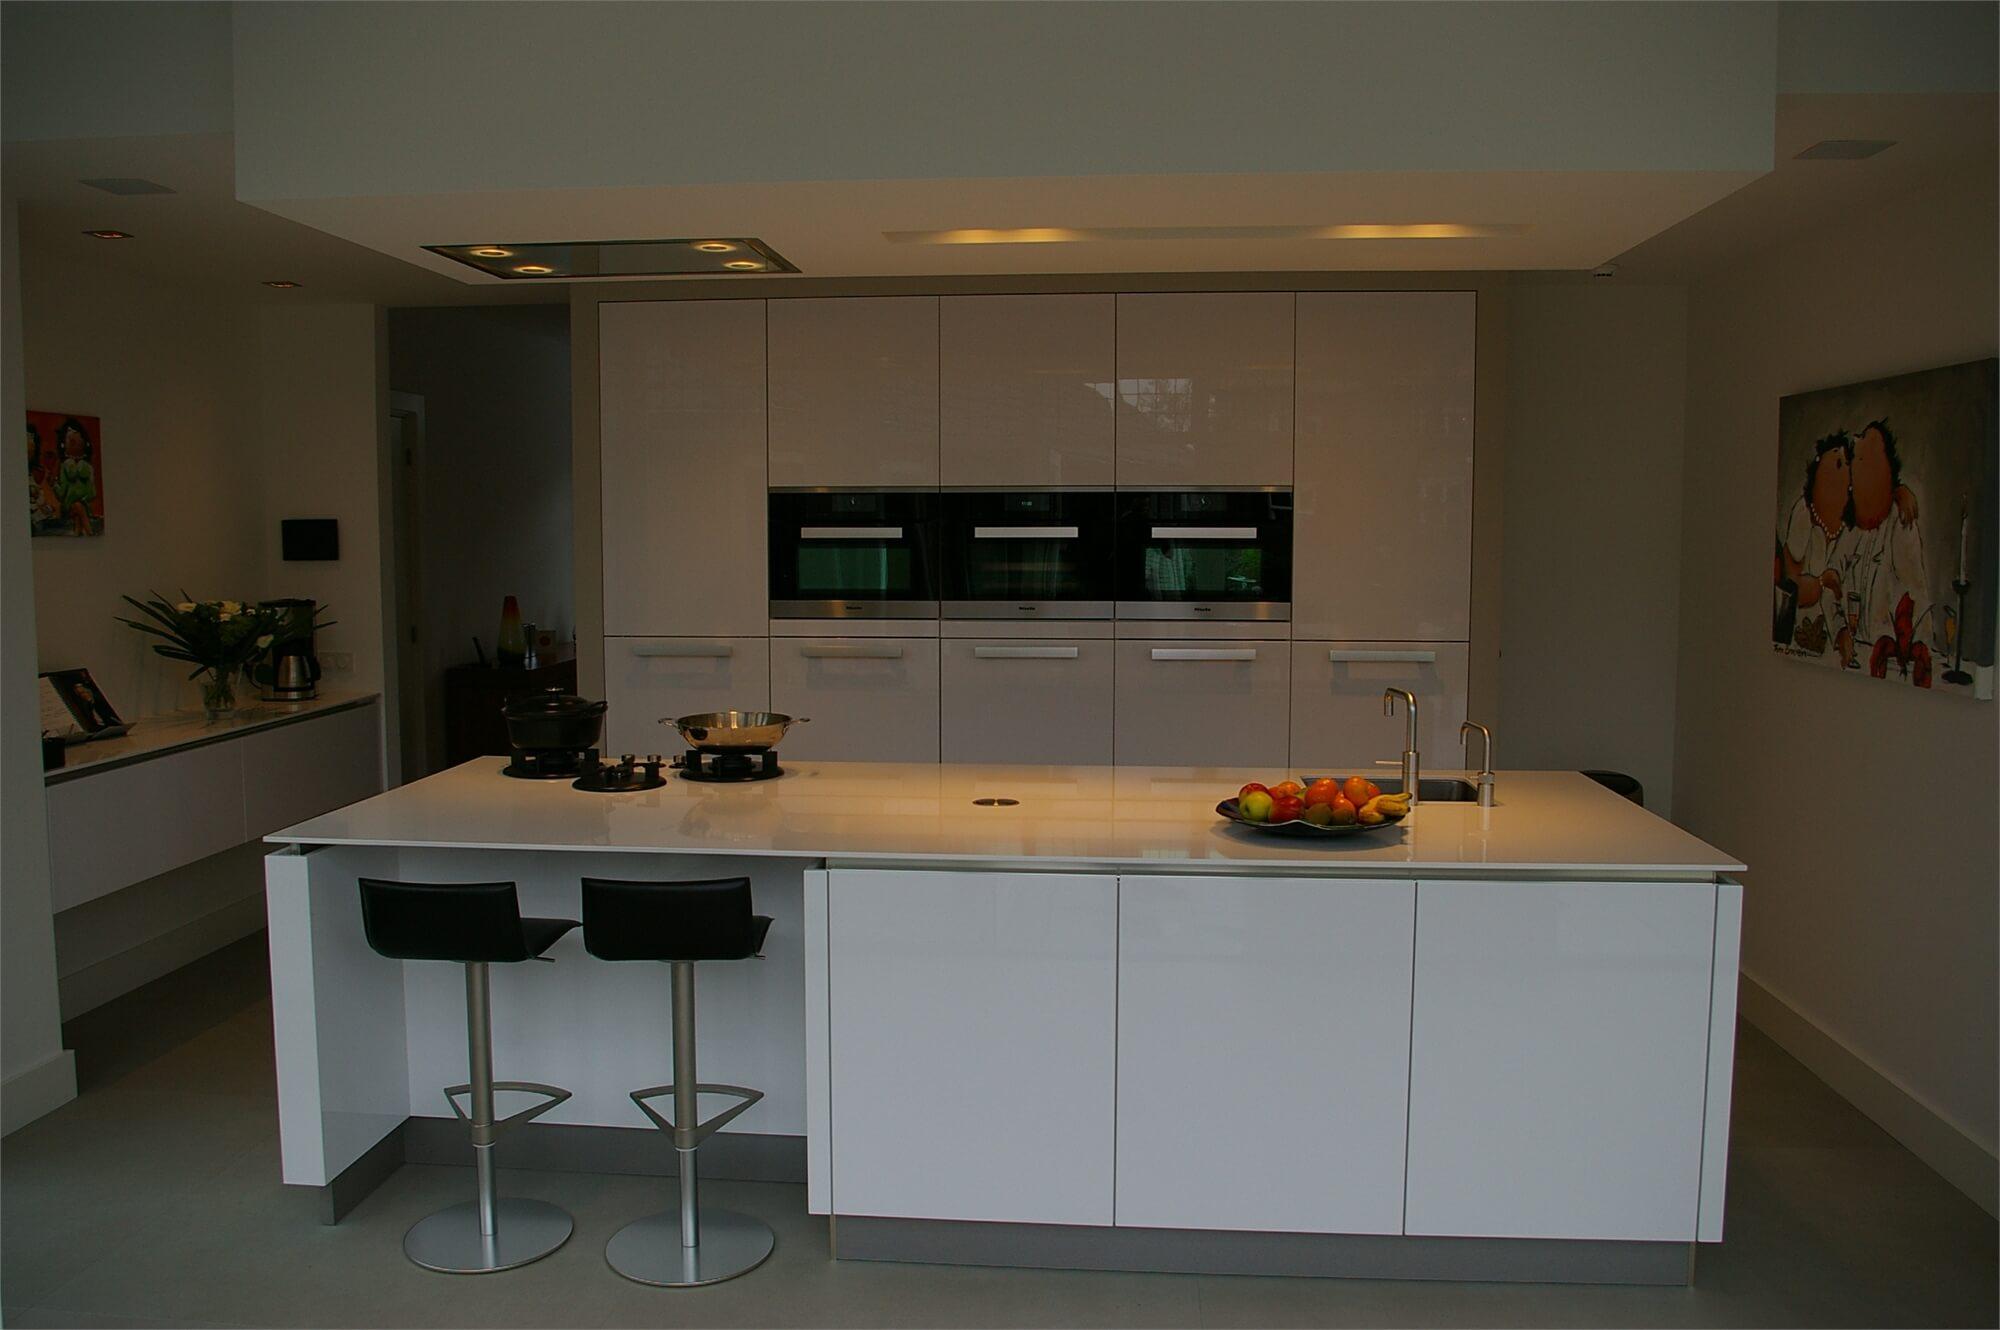 Moderne maatwerkkeukens manders keukens - Keuken uitgerust m ...